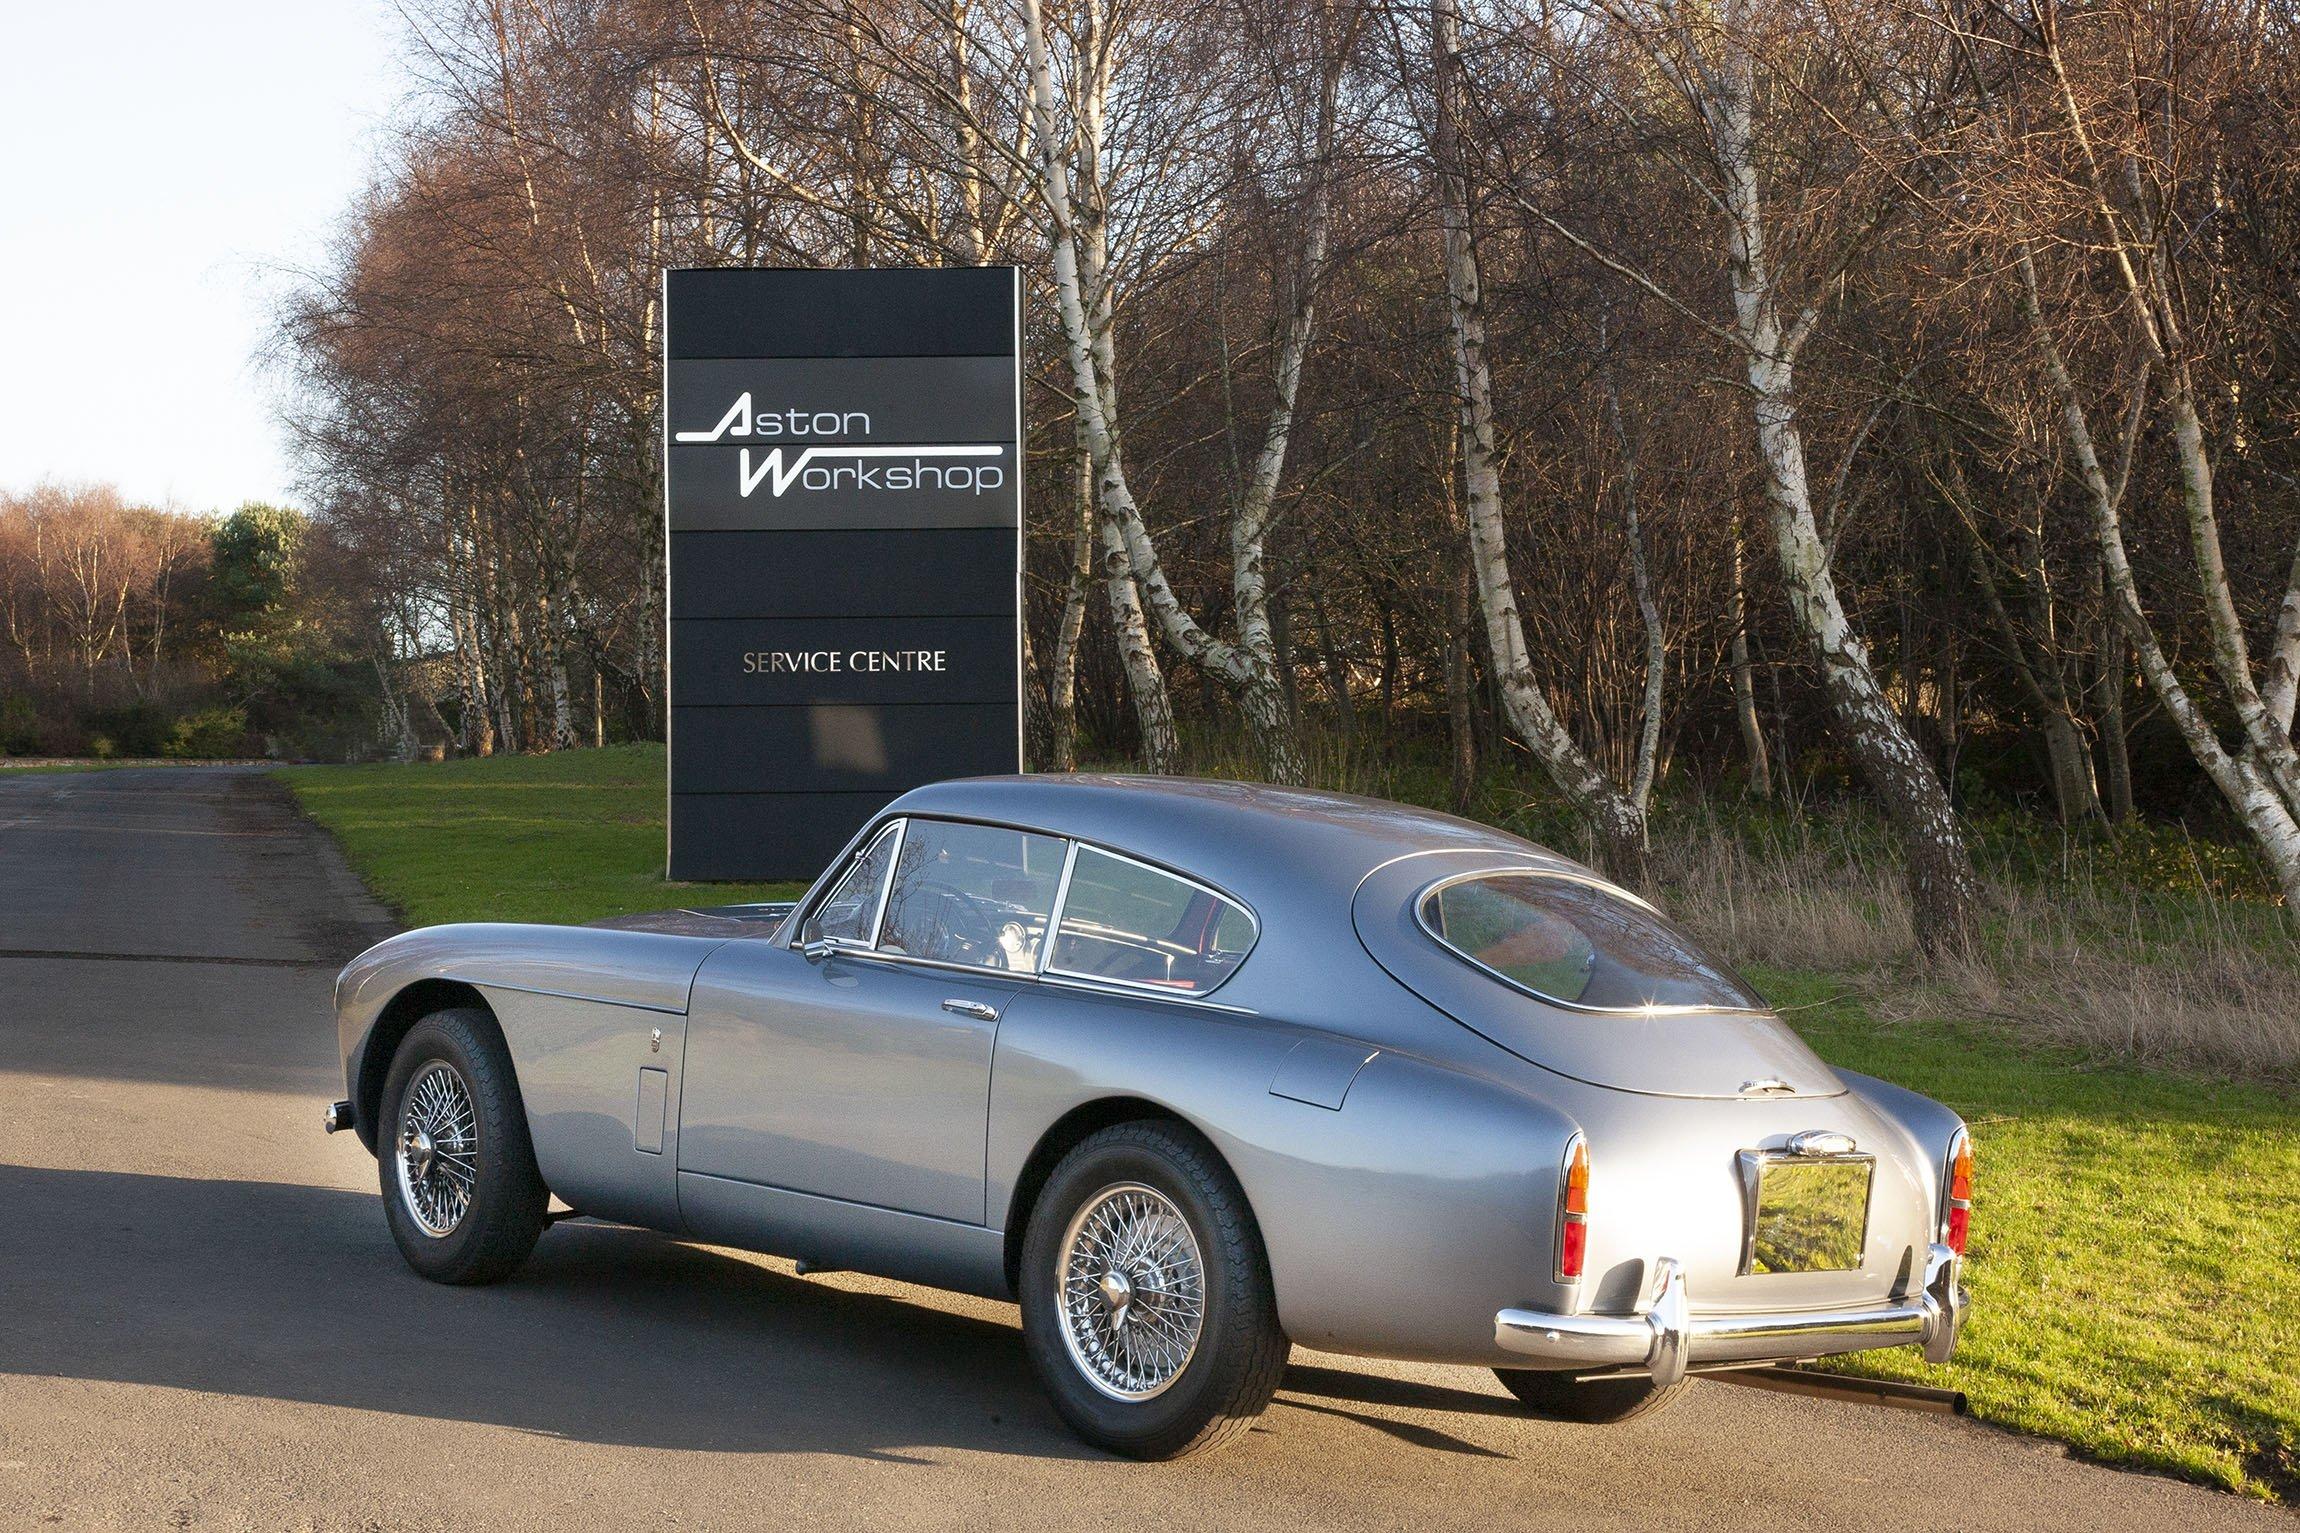 1950 Aston Martin Db2 Db Mkiii Oldtimer Zu Verkaufen